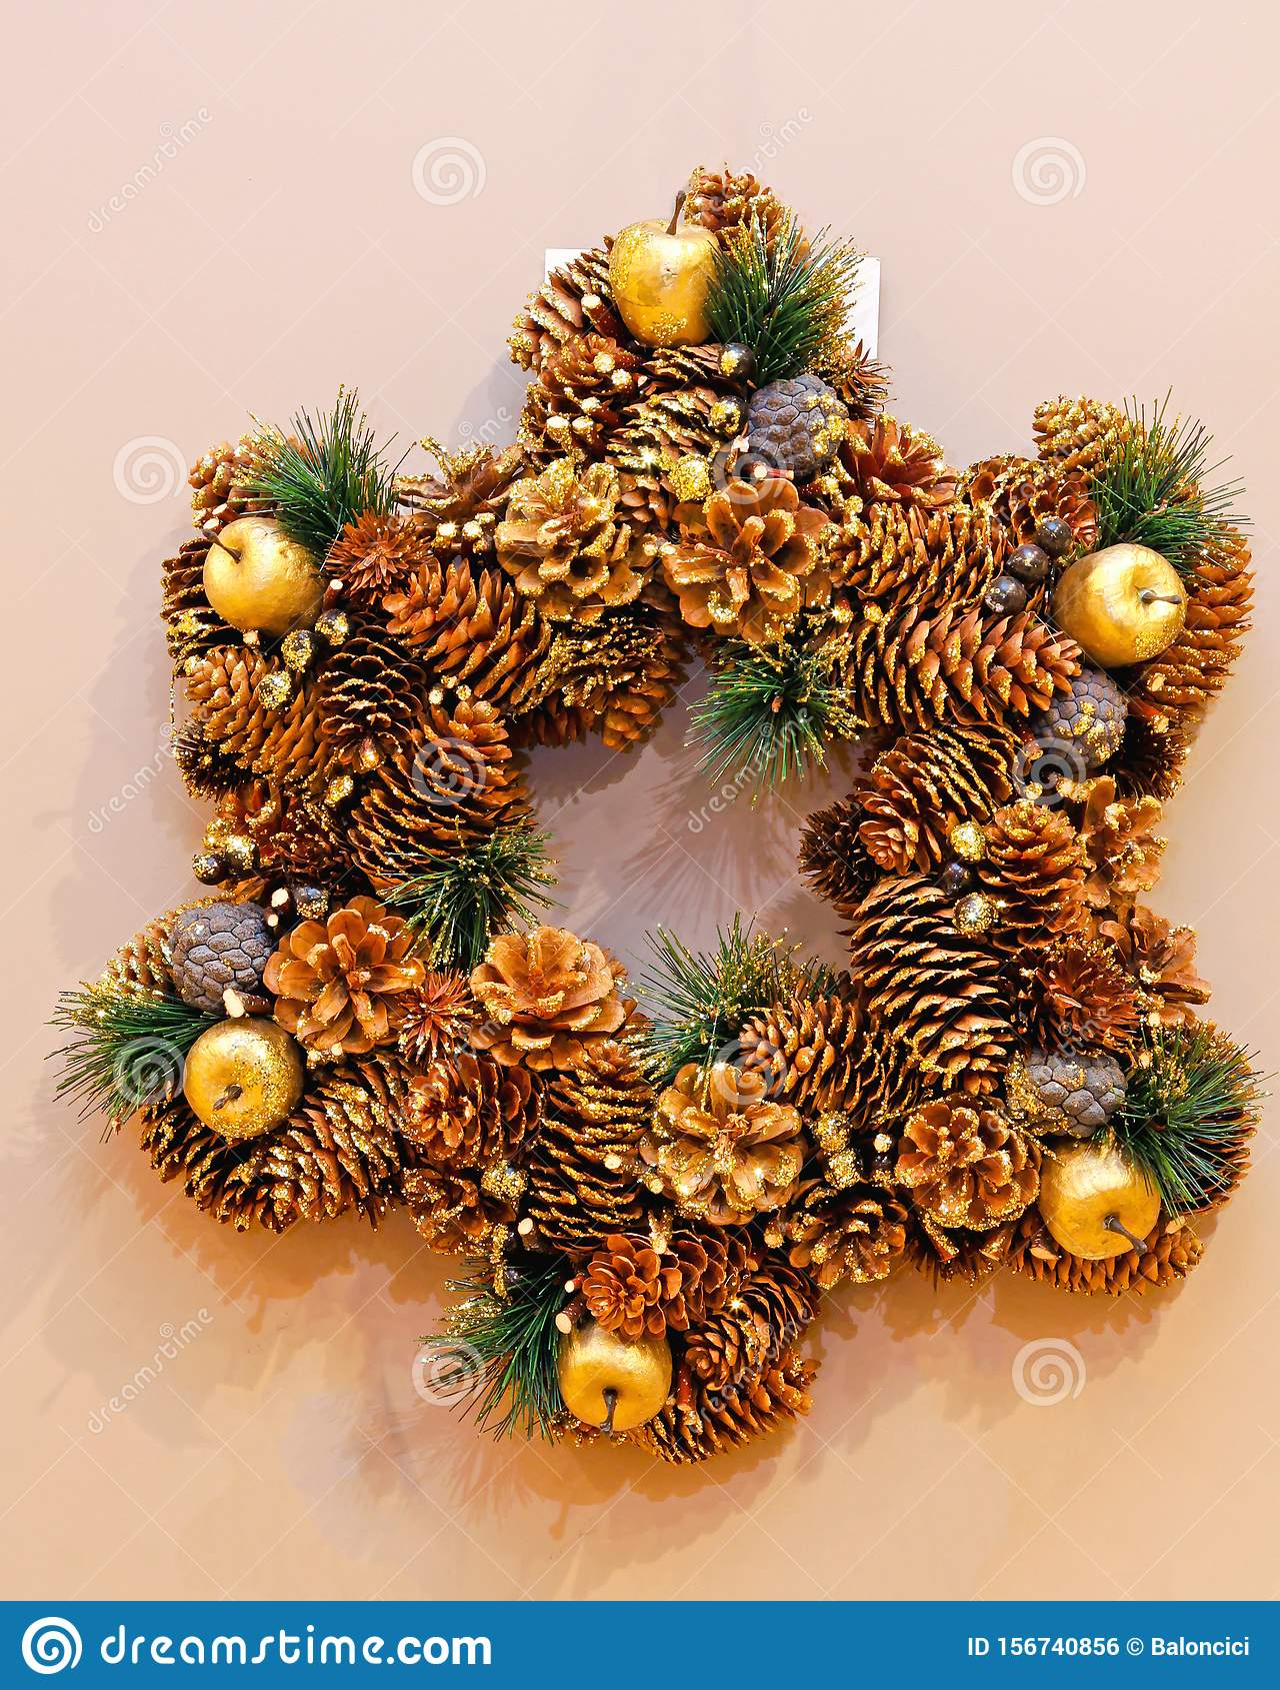 Pinecone Wreath Stock Photo Image Of Wall Christmas 156740856